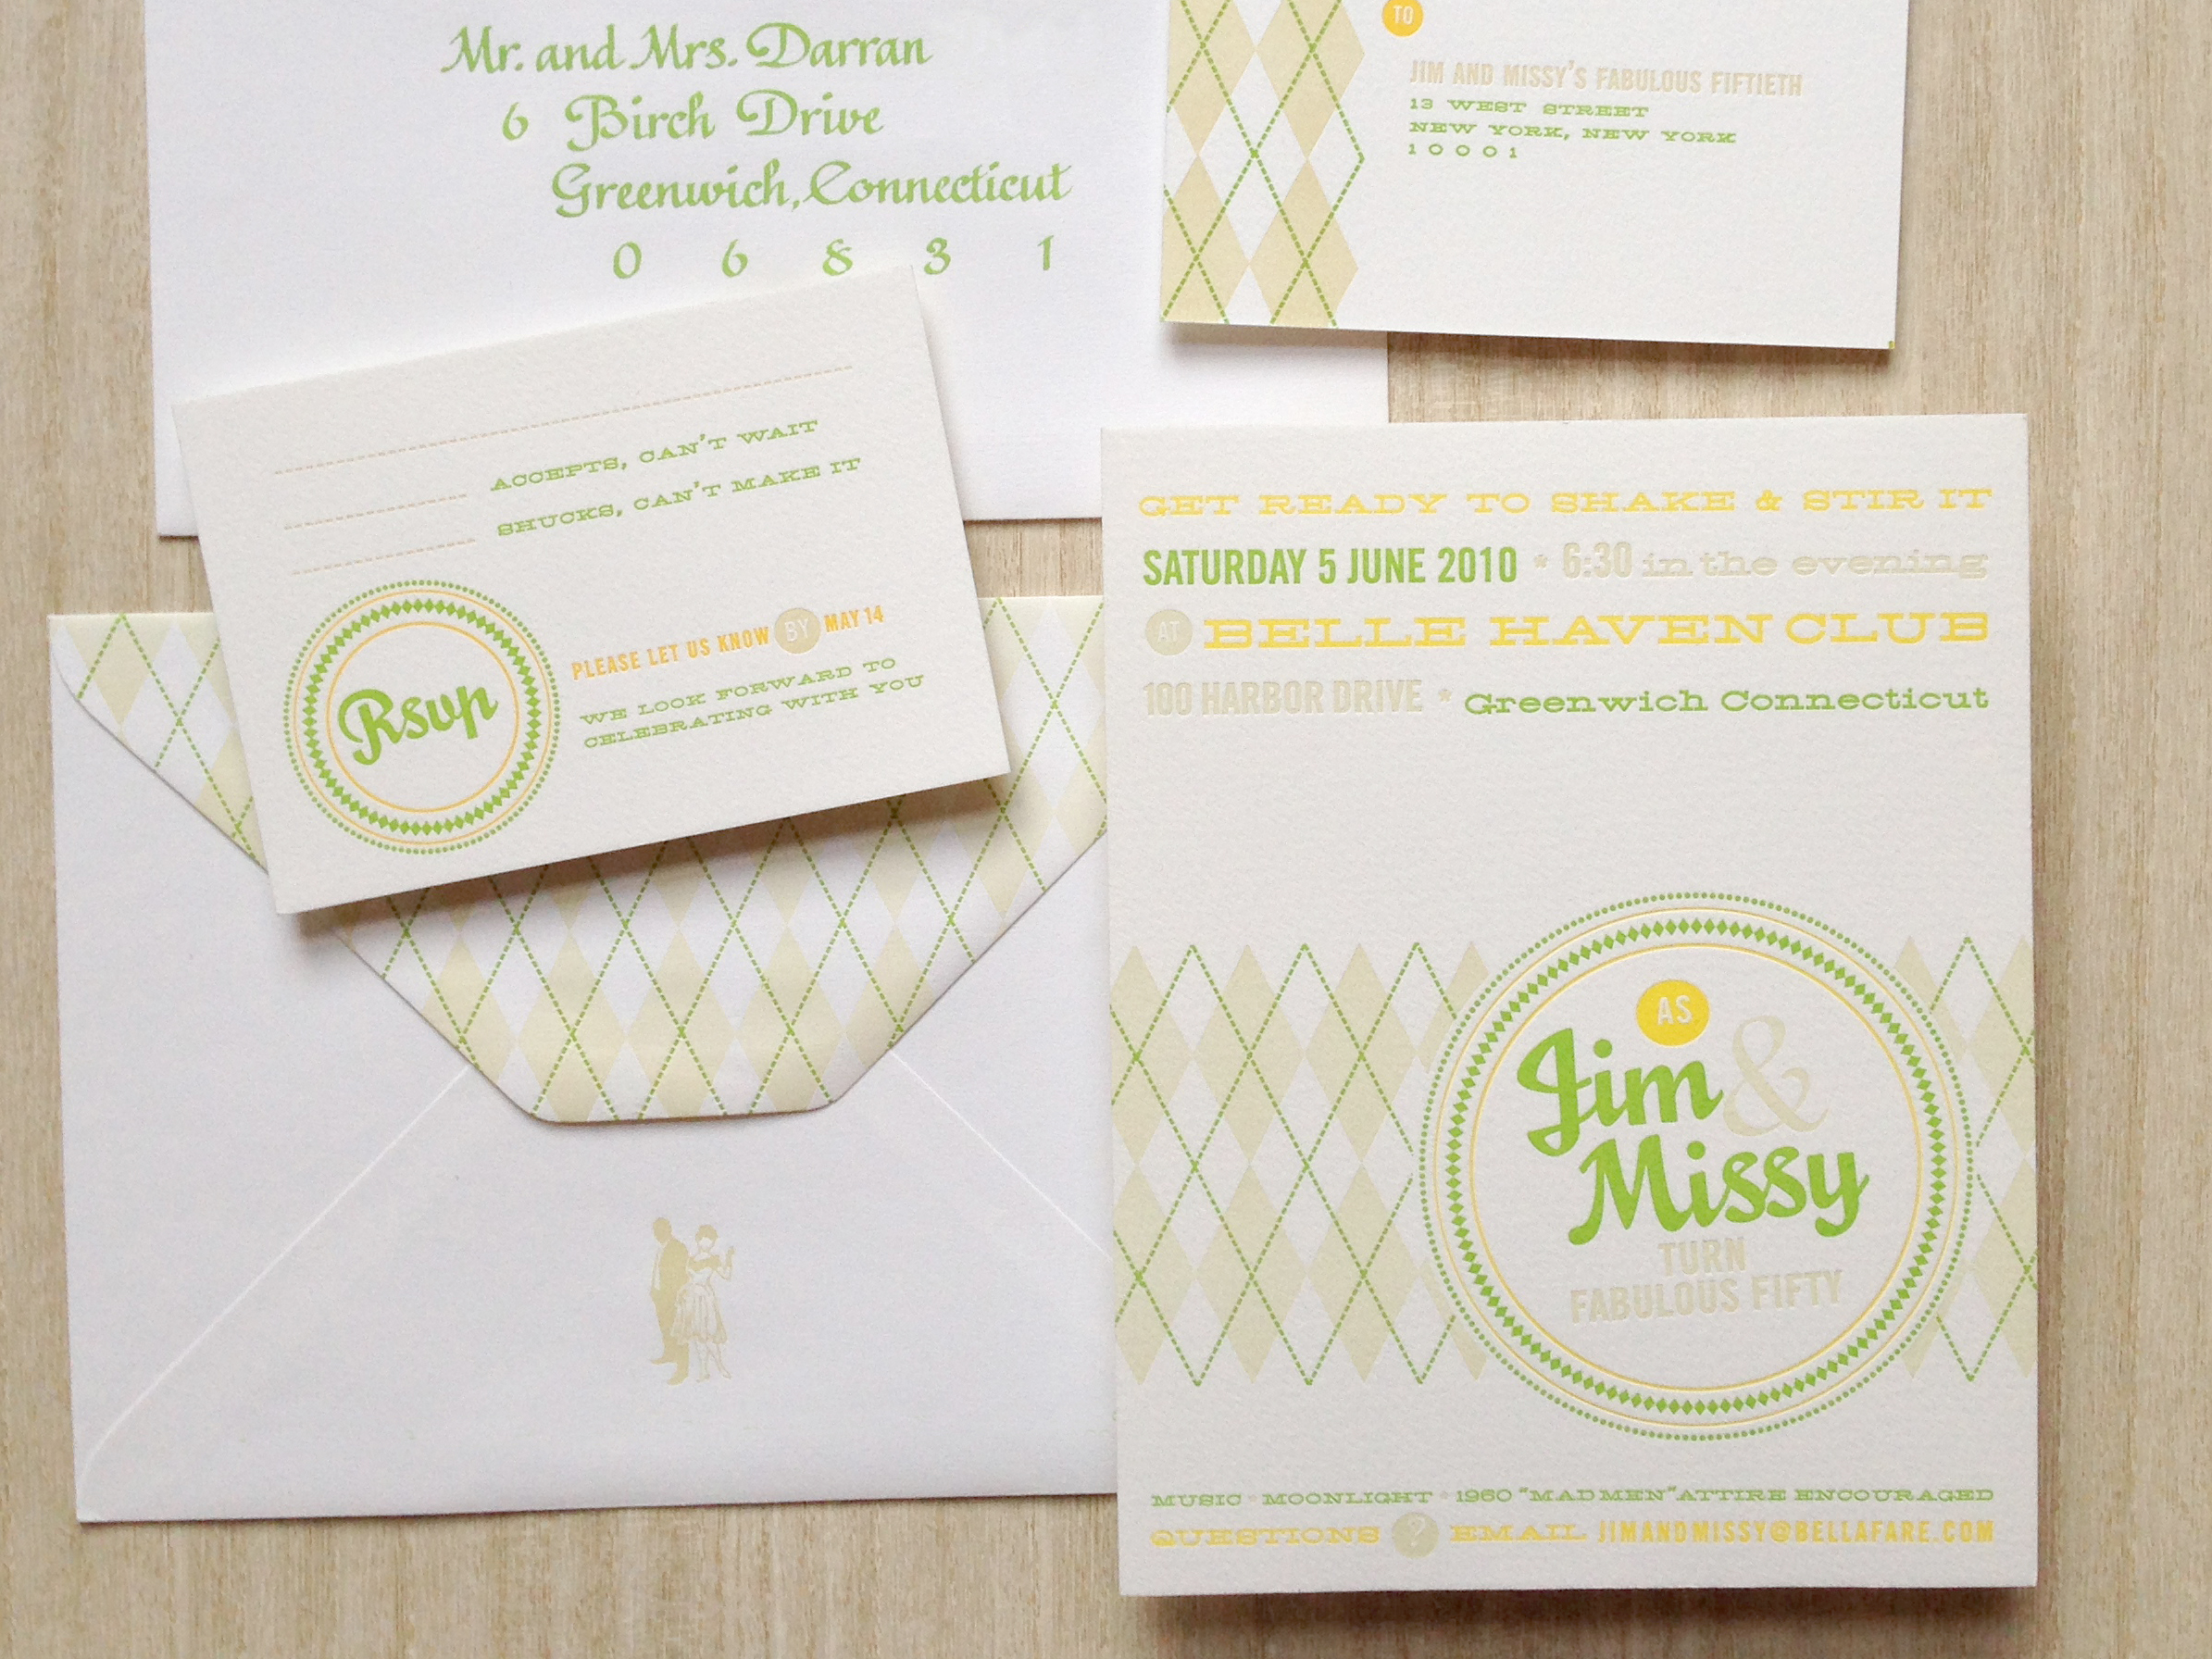 jim and missy address edit.jpg